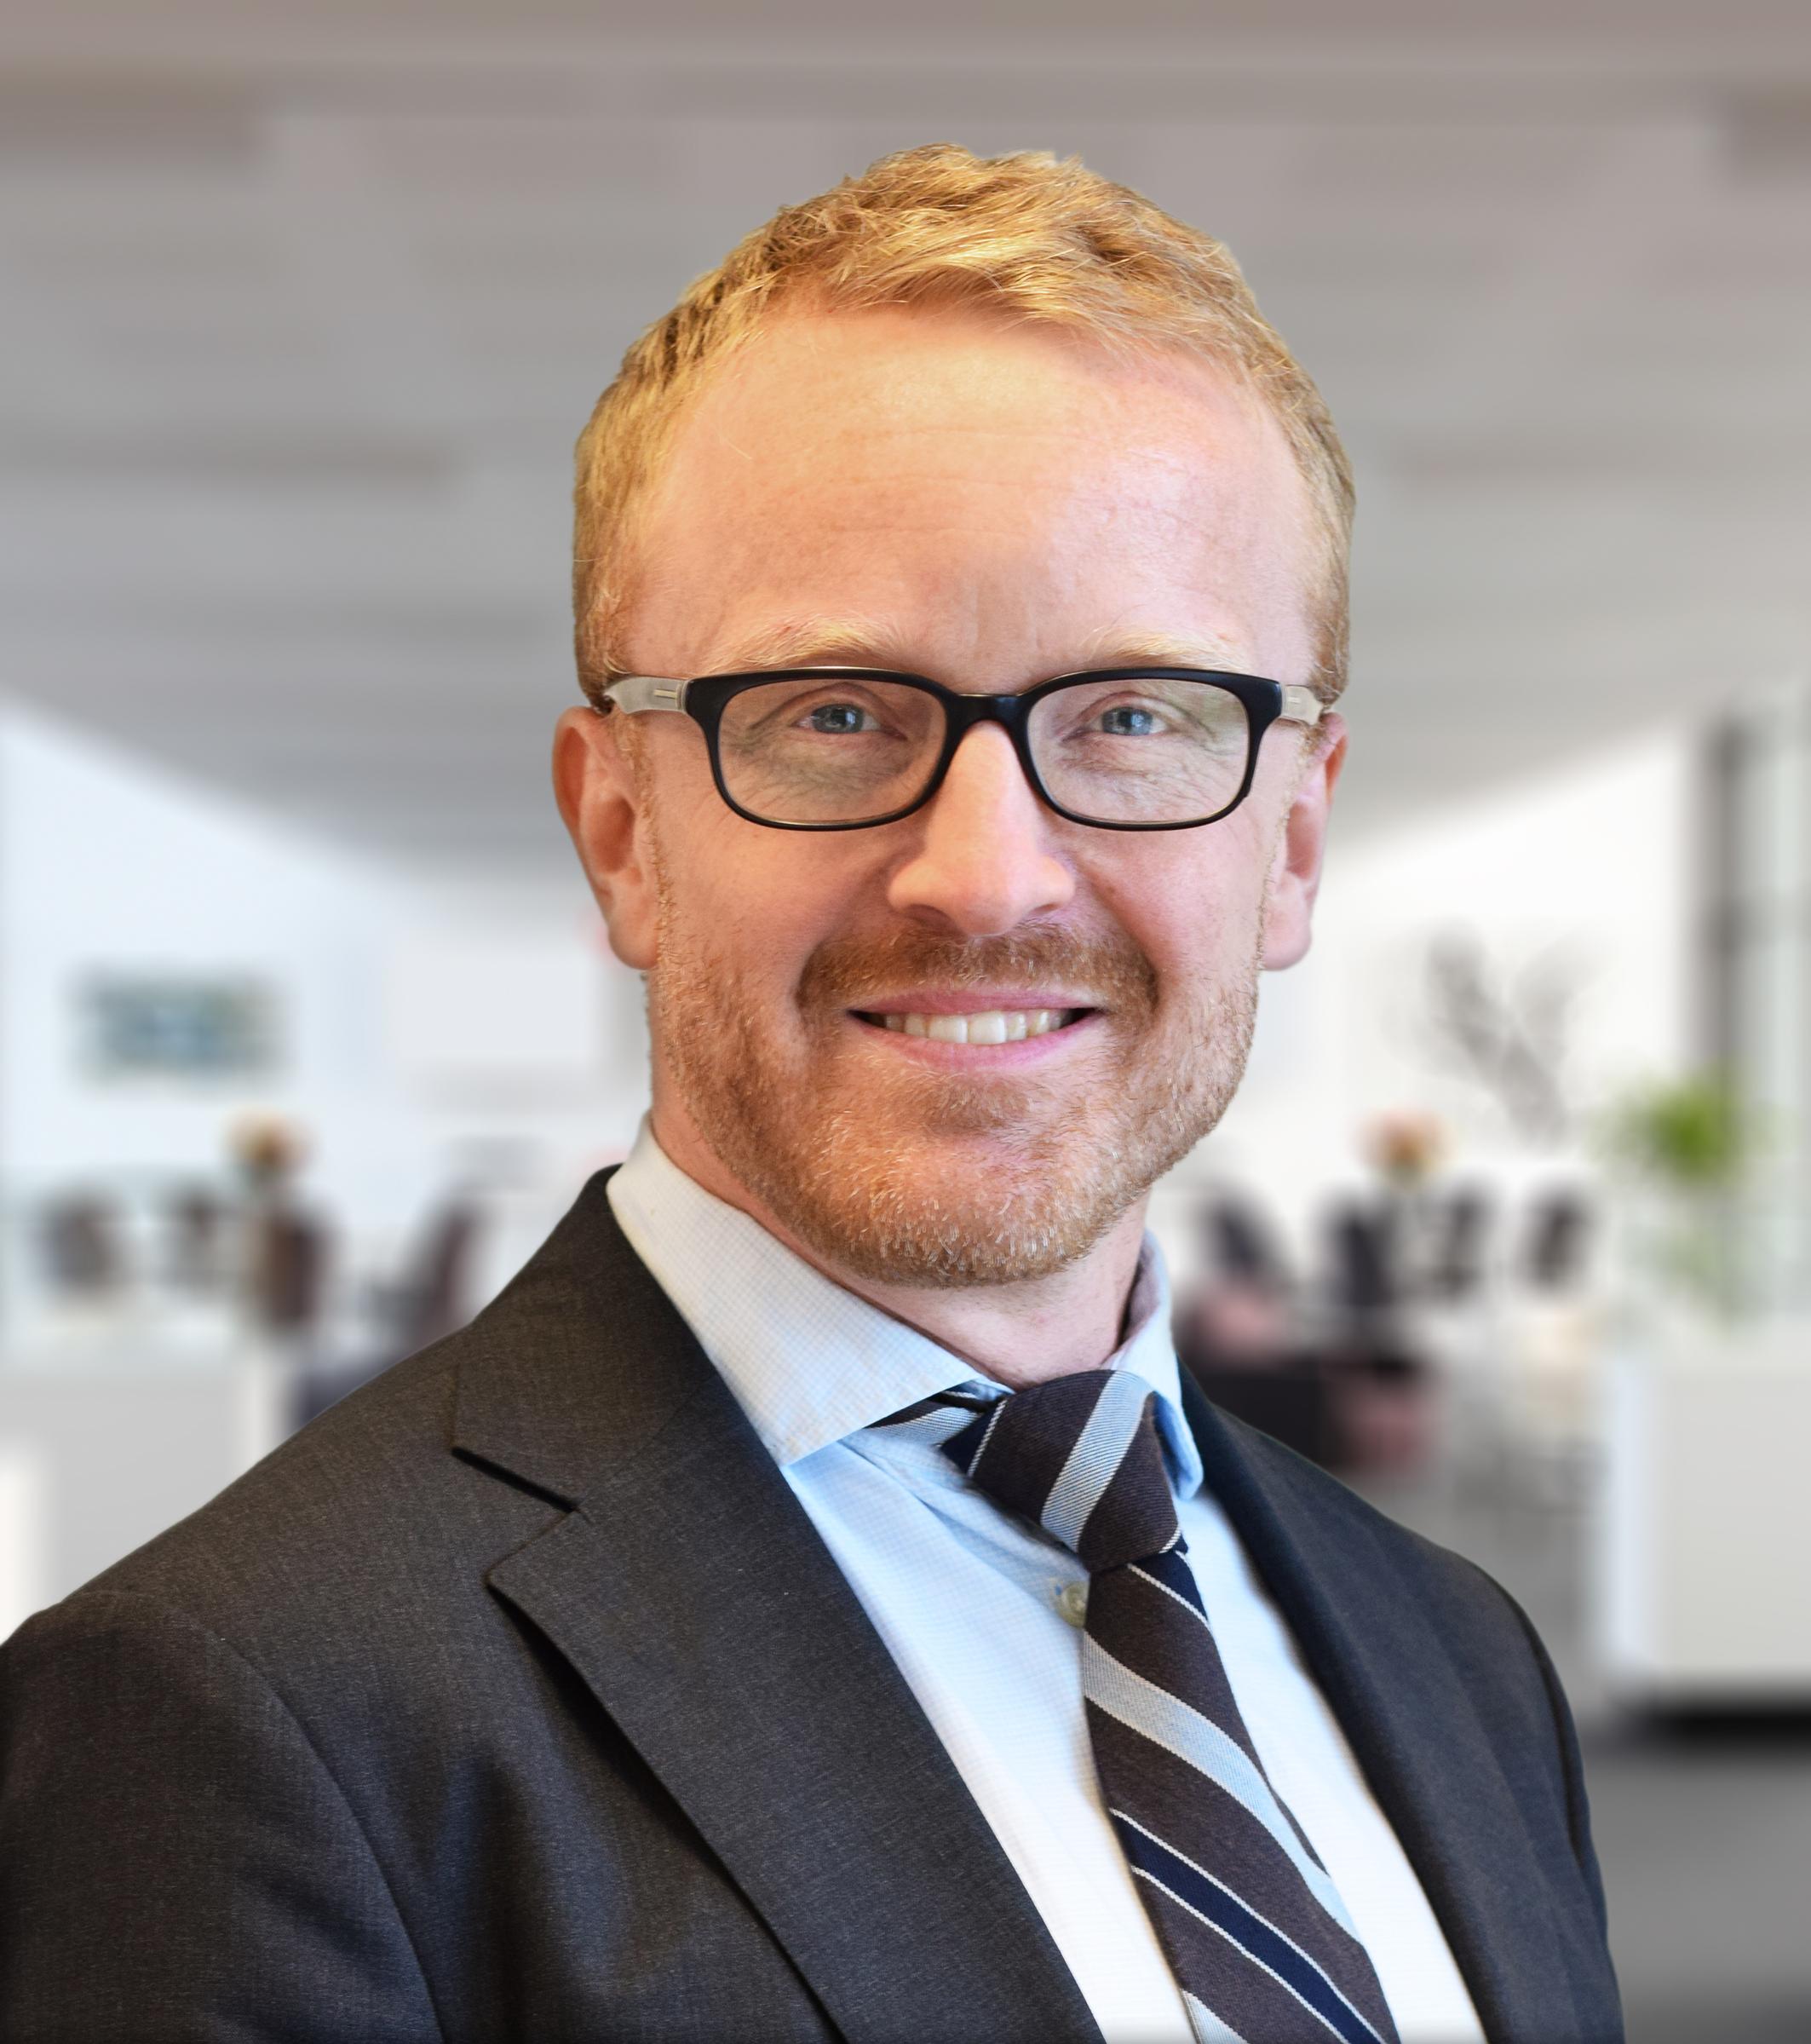 Andreas Nilsson 重点客户经理  发送邮件